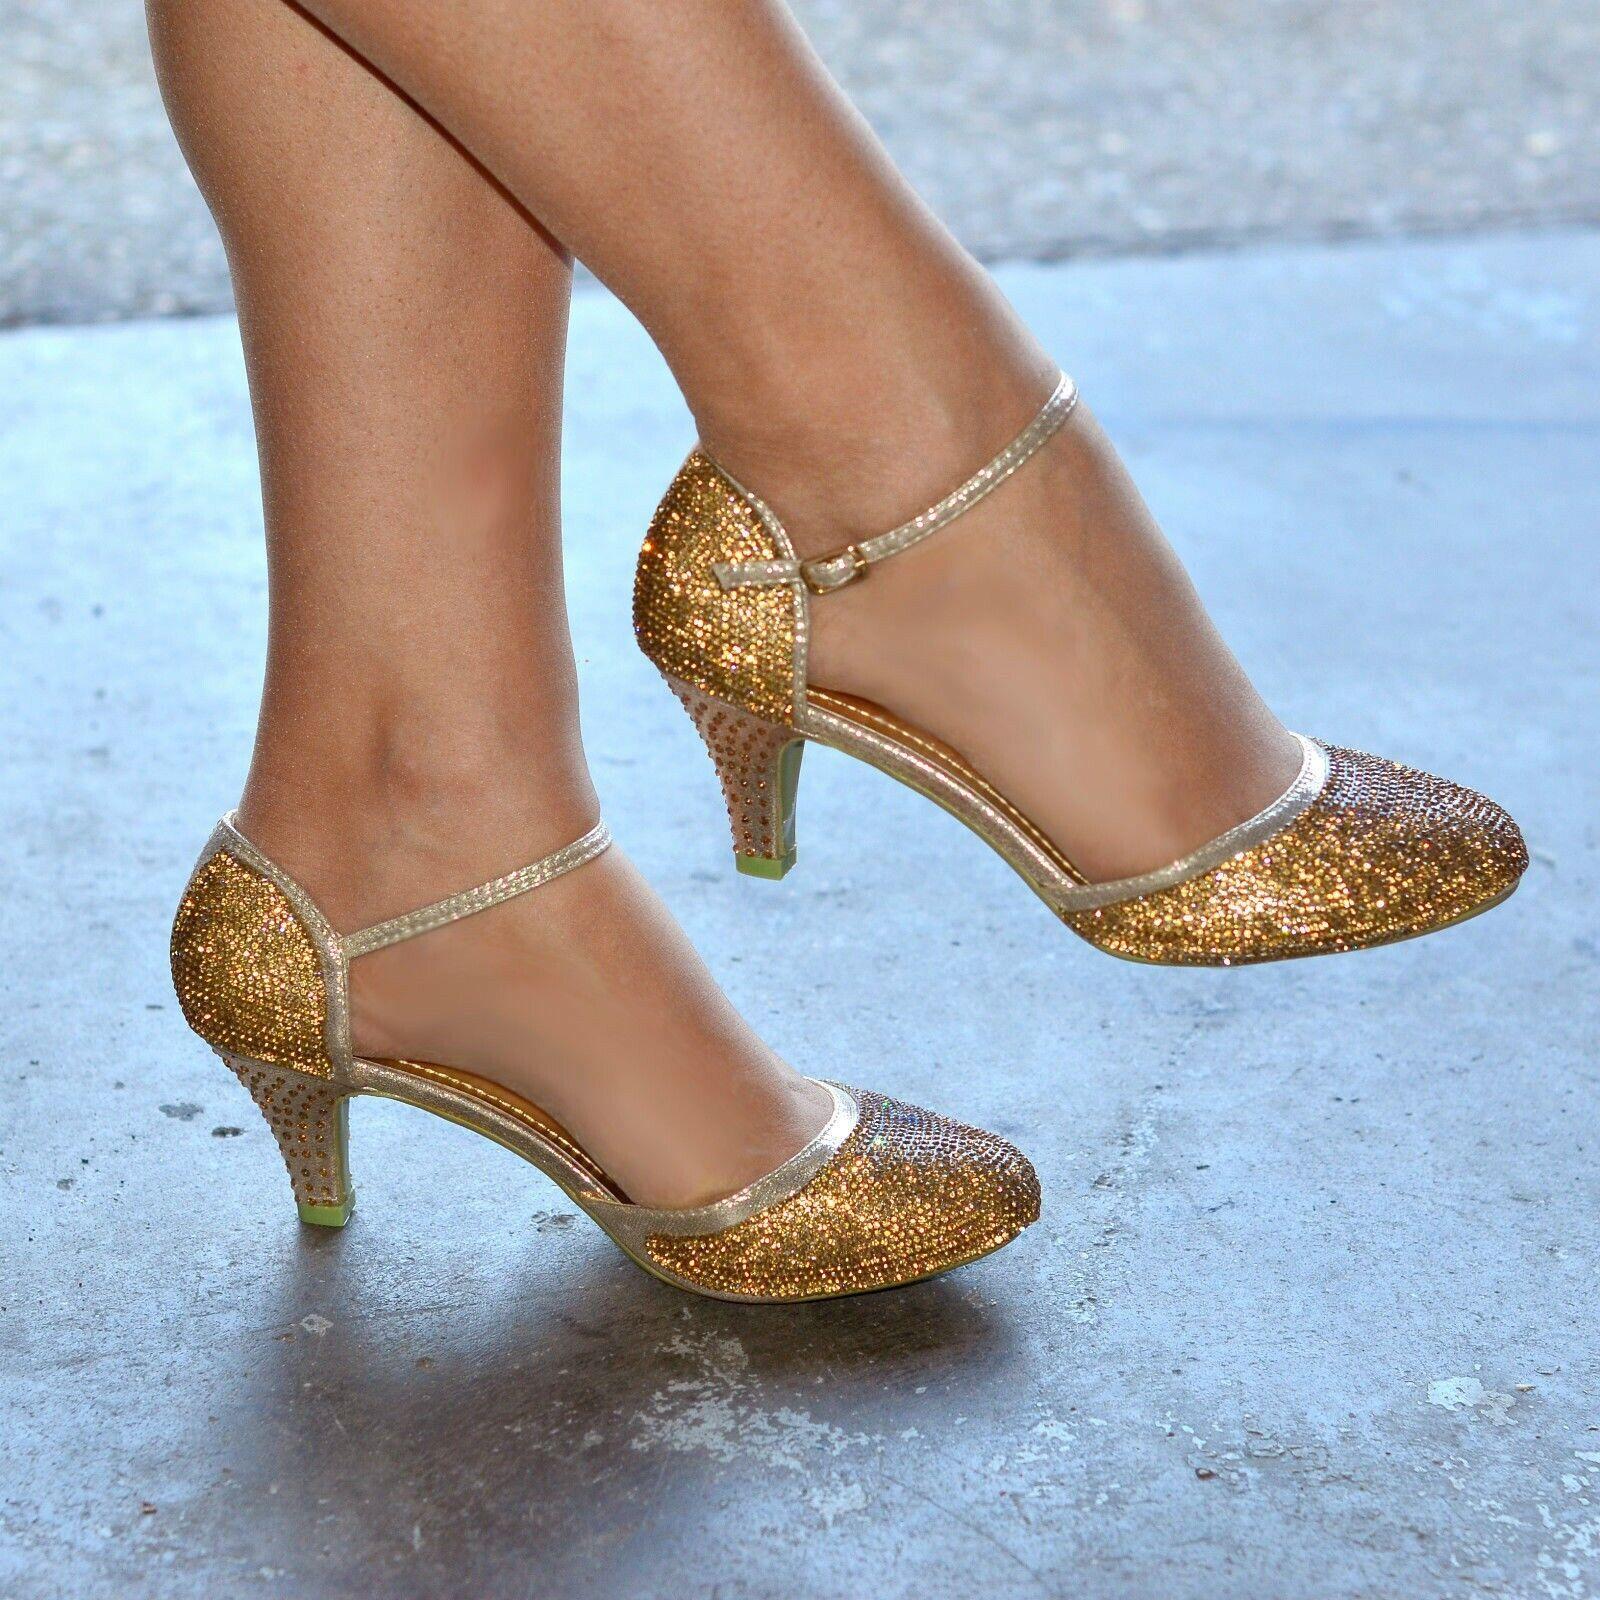 Ladies Diamante Low Heel Ankle Strap Sandals Jive Dancing Shoes GOLD size 3